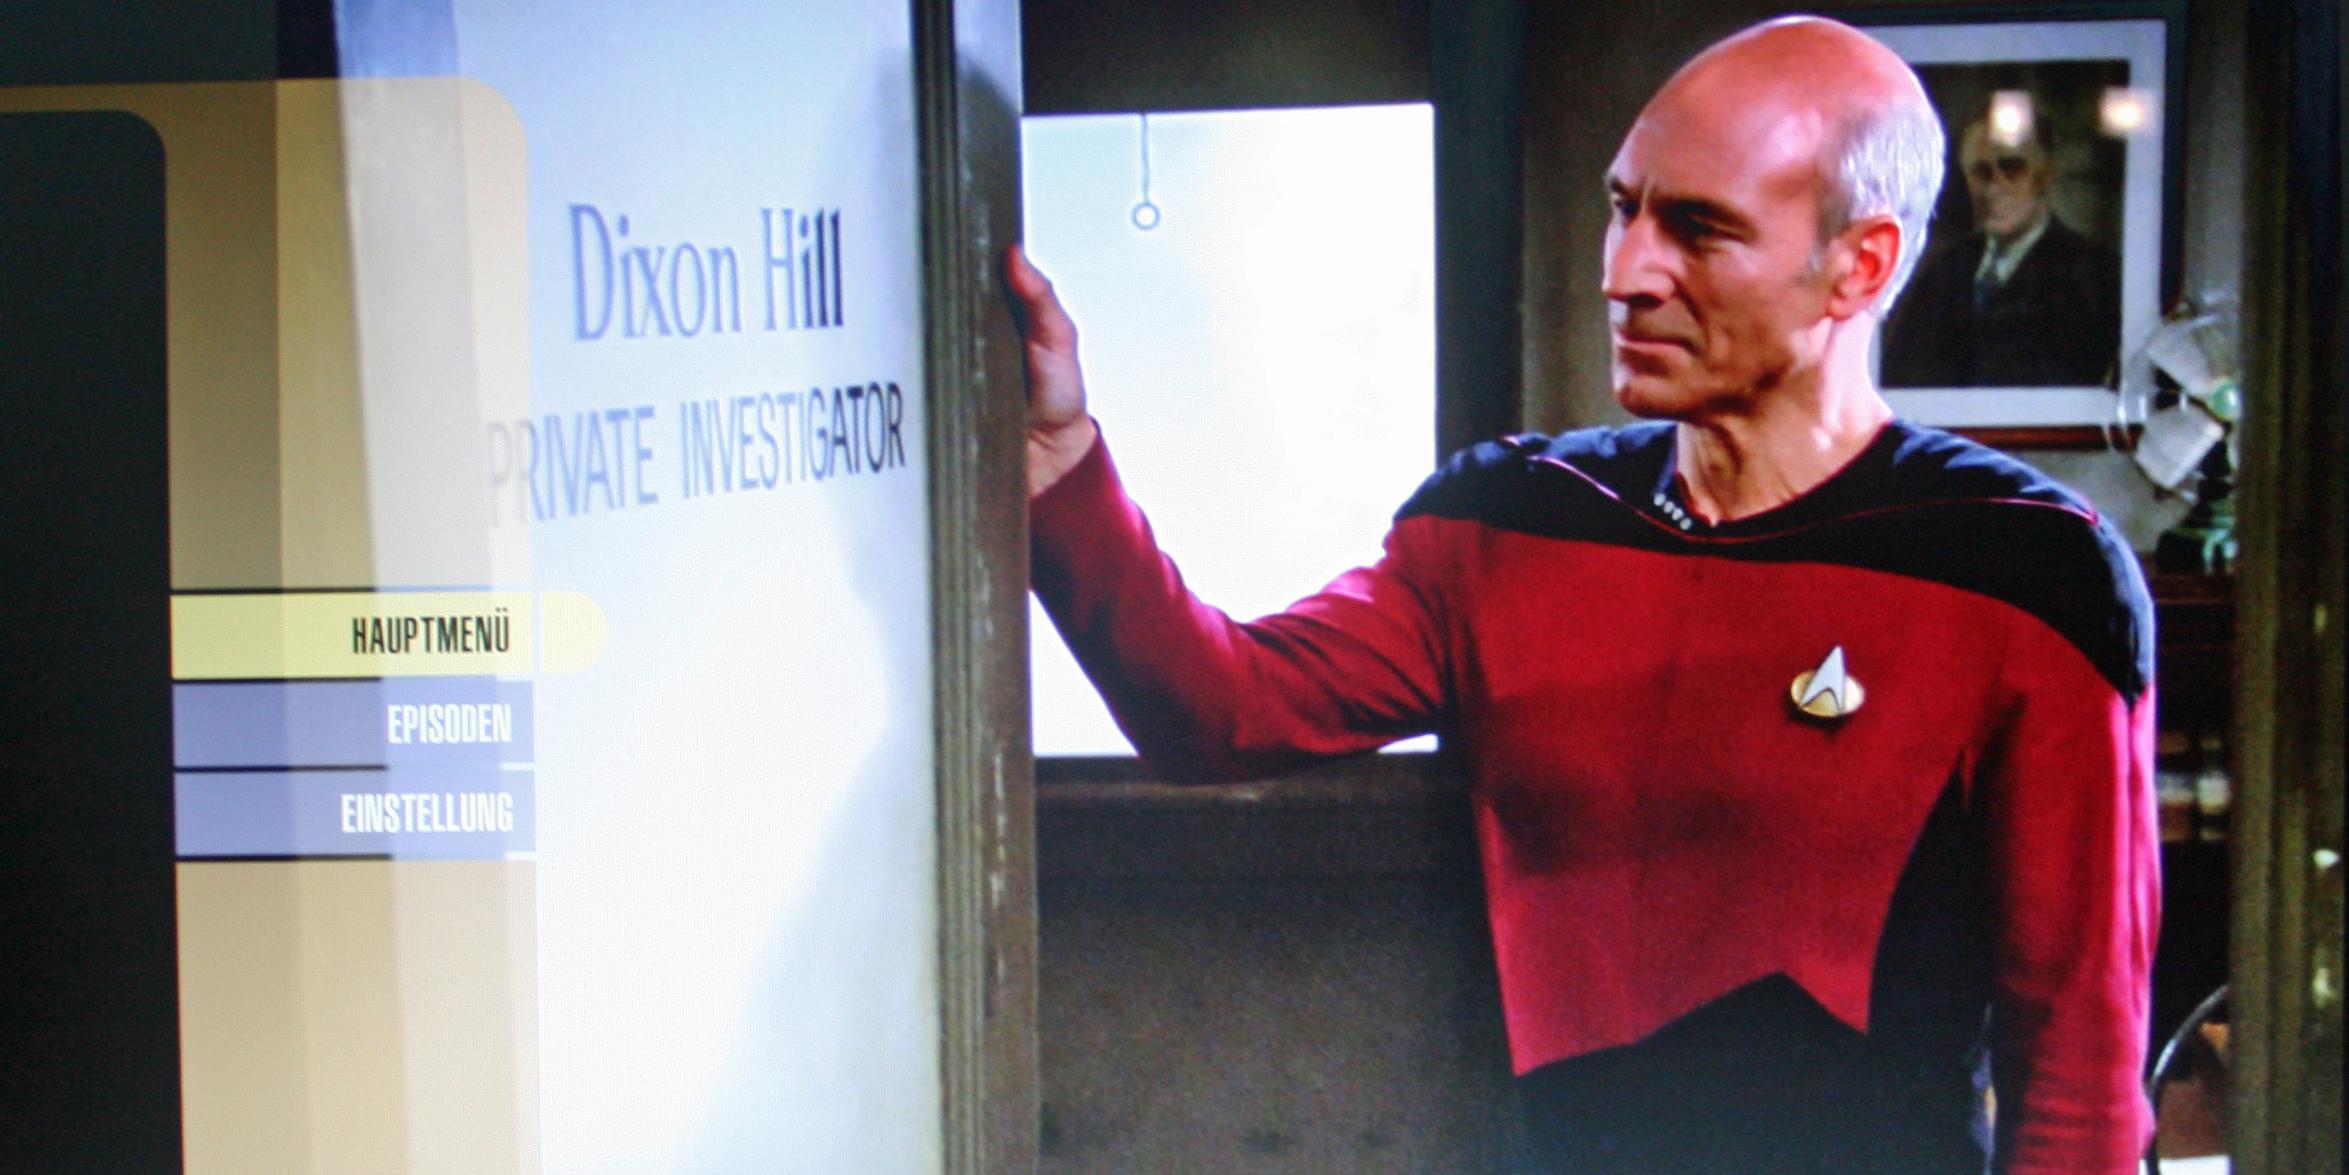 Star Trek: The Next Generation Season - Blu-ray Popup-Menü